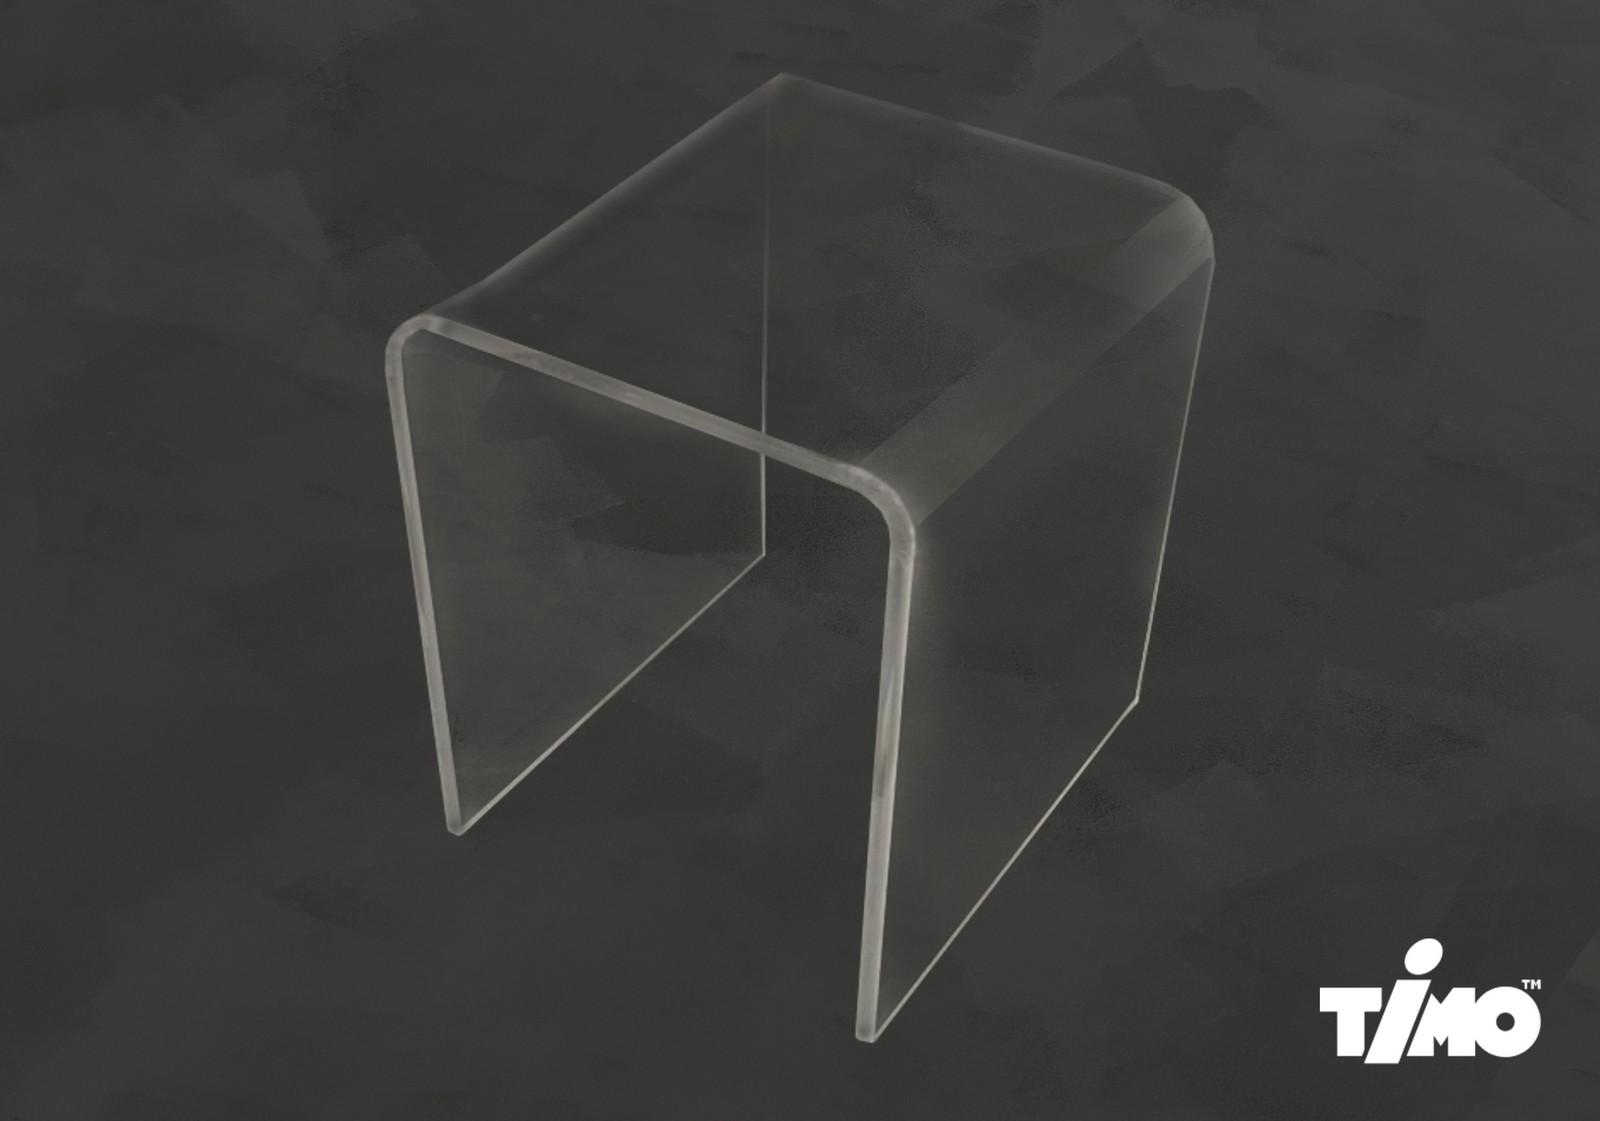 Душевая кабина Timo ILMA 102 R